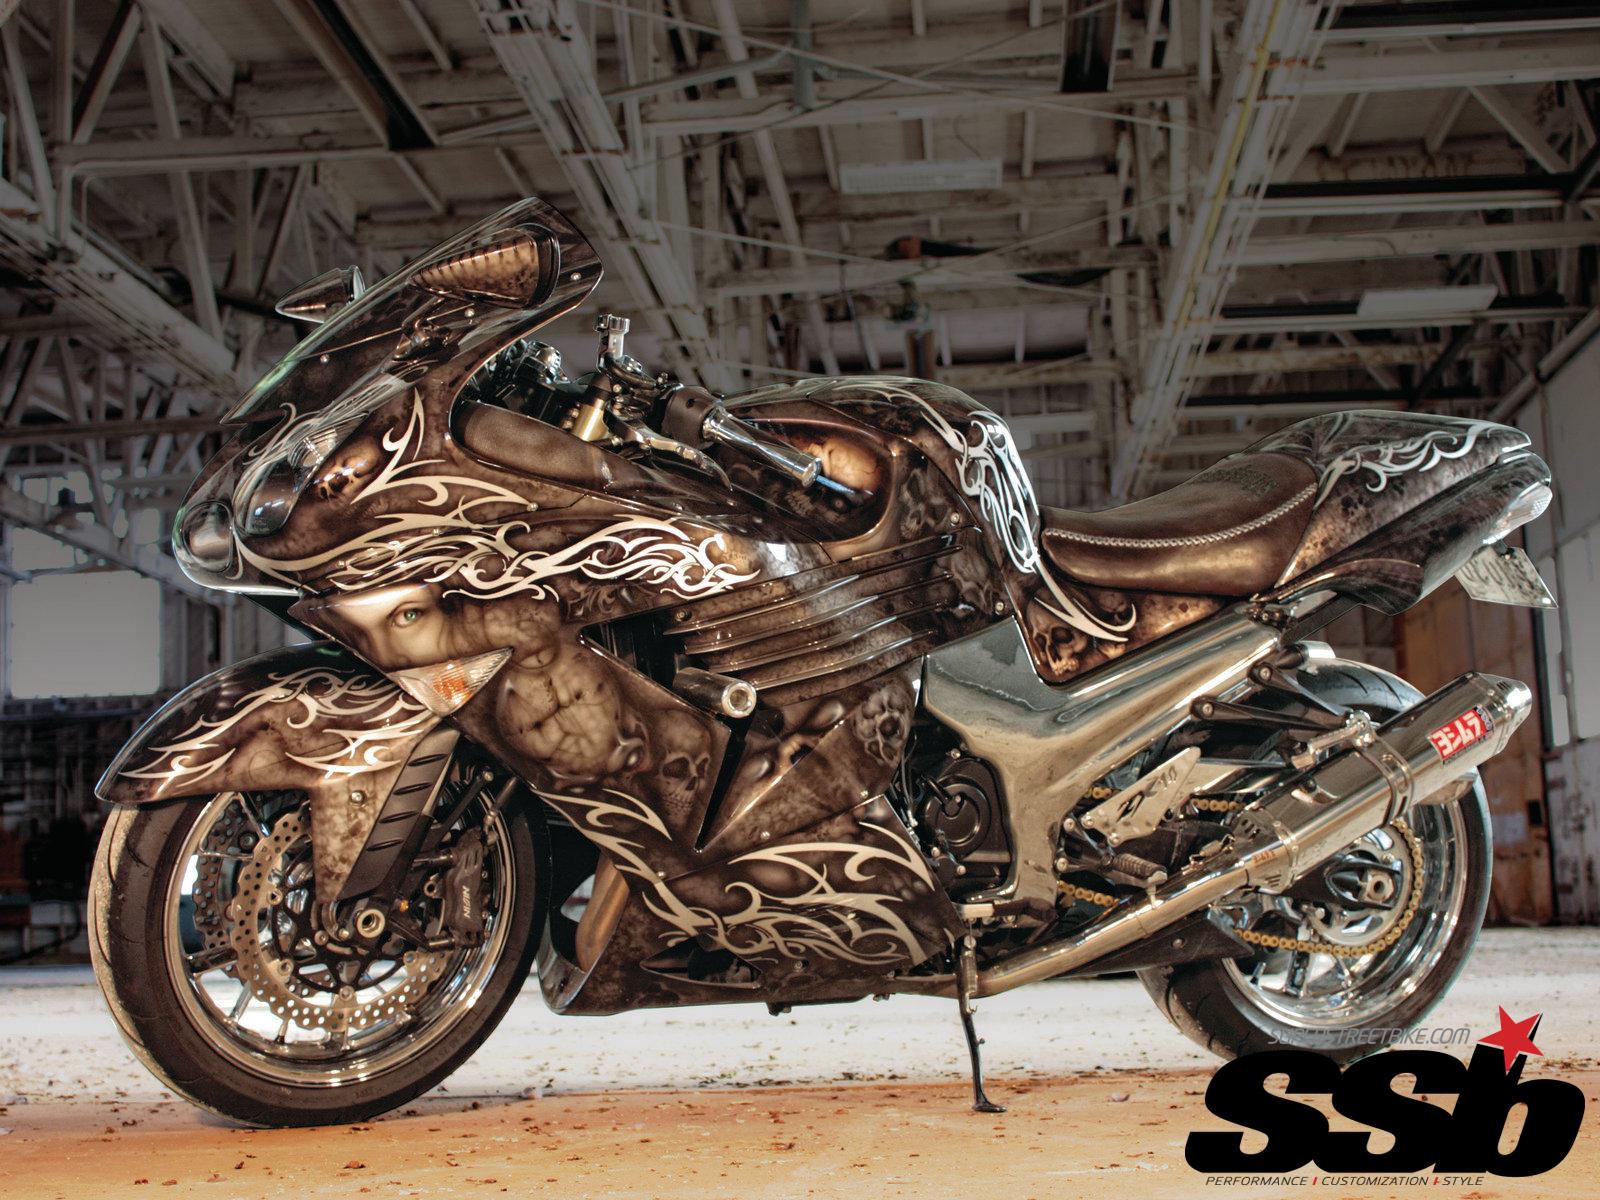 Insane Kawasaki Bike Hd Wallpaper: Kawasaki Wallpapers, Pictures, Images